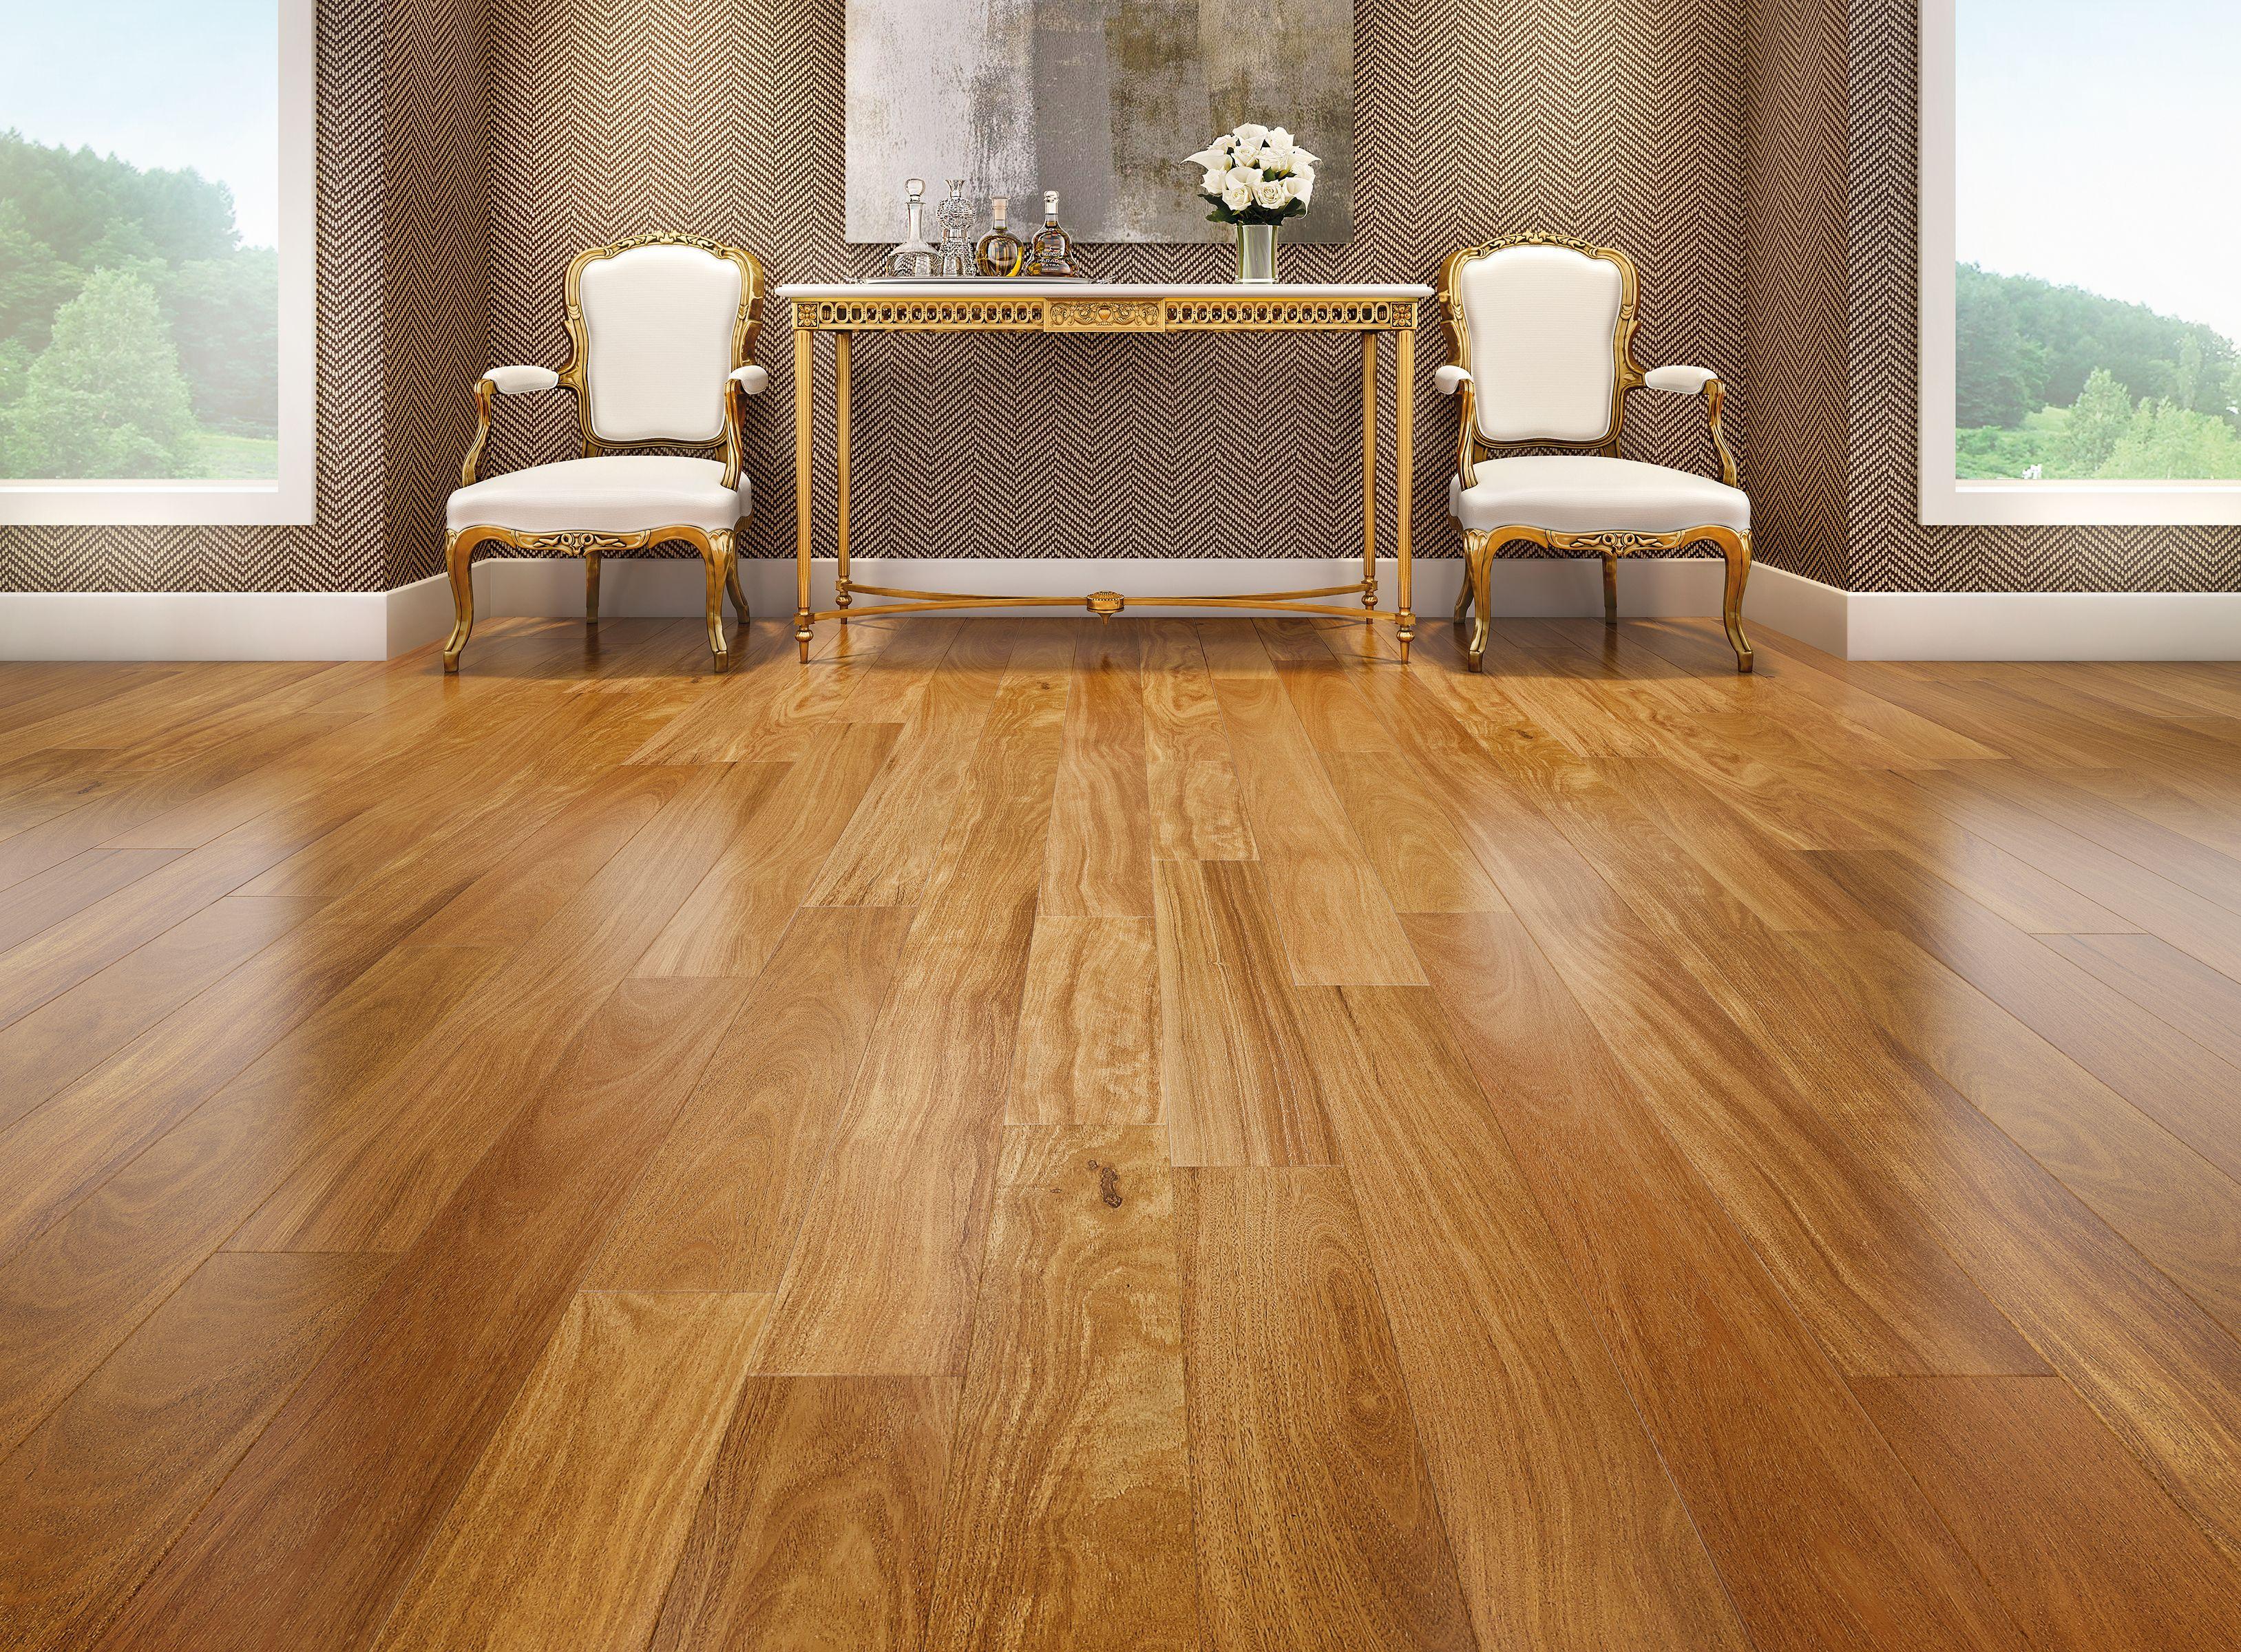 Brazilian Teak Engineered Hardwood Floor Decor Teak Flooring Engineered Hardwood Hardwood Floors